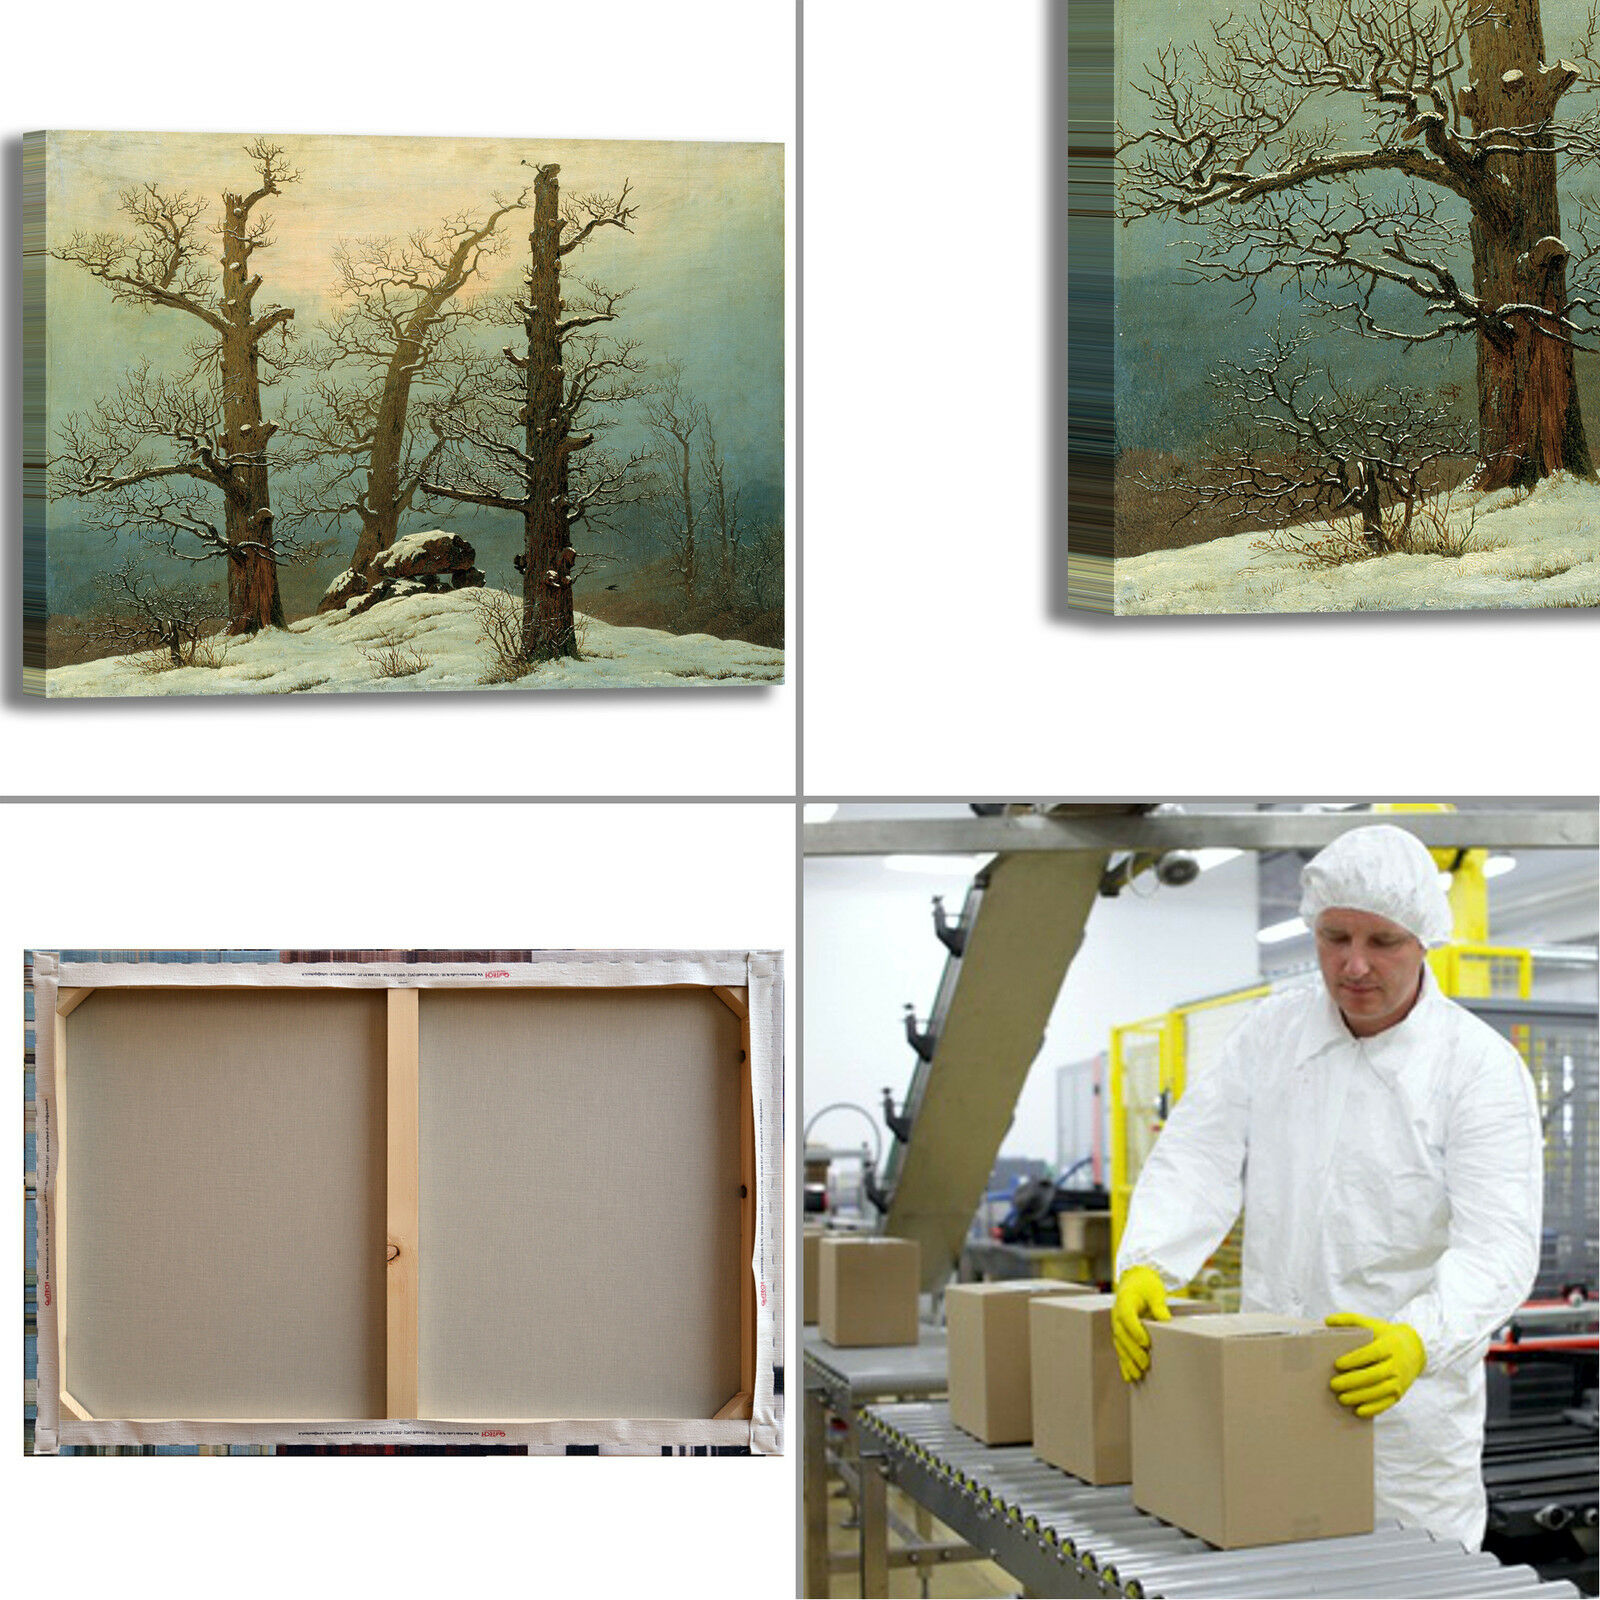 Caspar tumulo di design neve design di quadro stampa tela dipinto telaio arRouge o casa 569fca